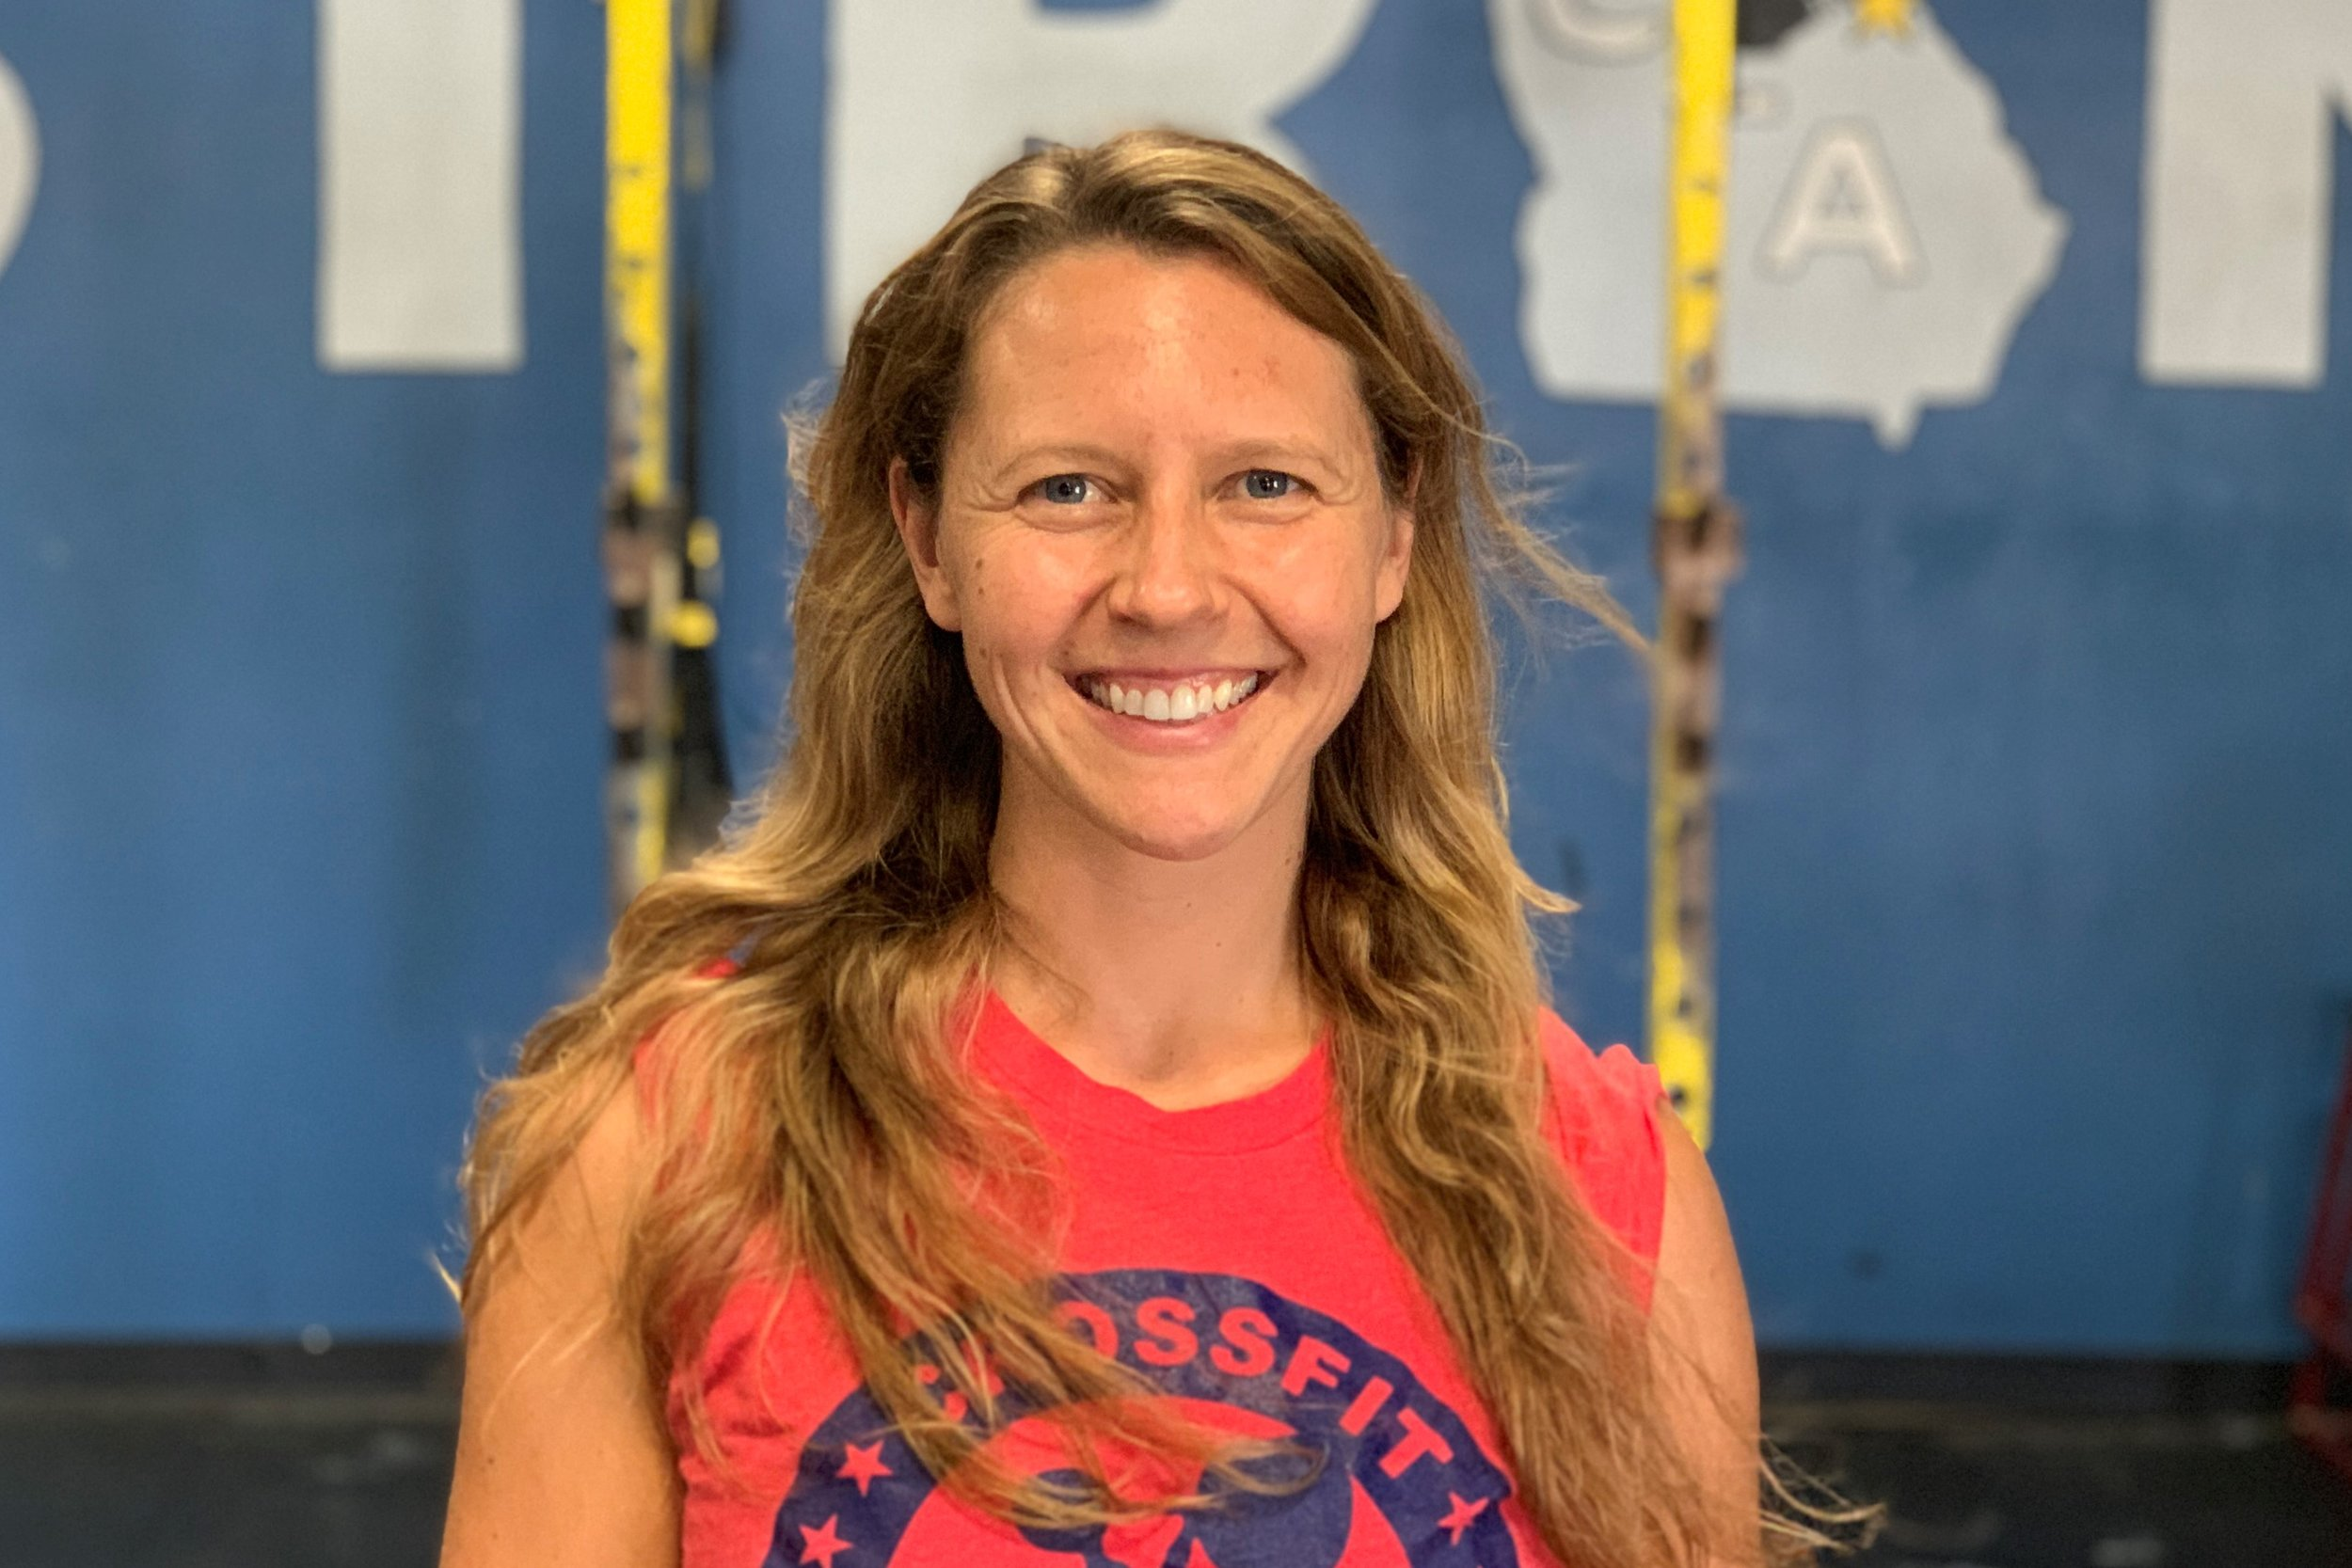 Erica Kolcz - Group Classes, Personal Training, Corporate Wellness